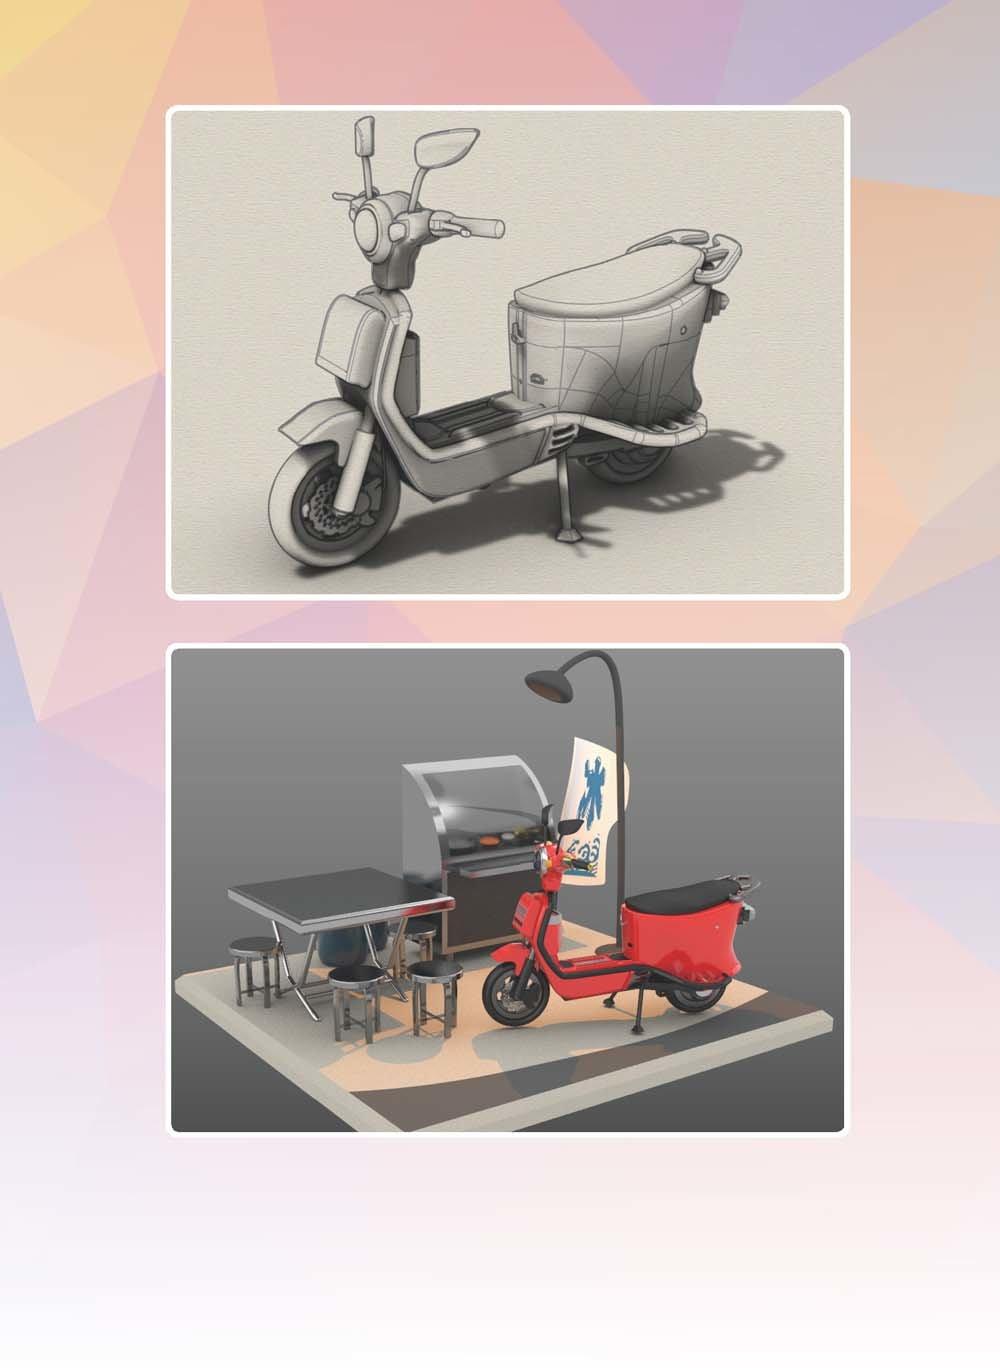 Rhinoceros 6 全攻略:自學設計與 3D建模寶典-preview-8